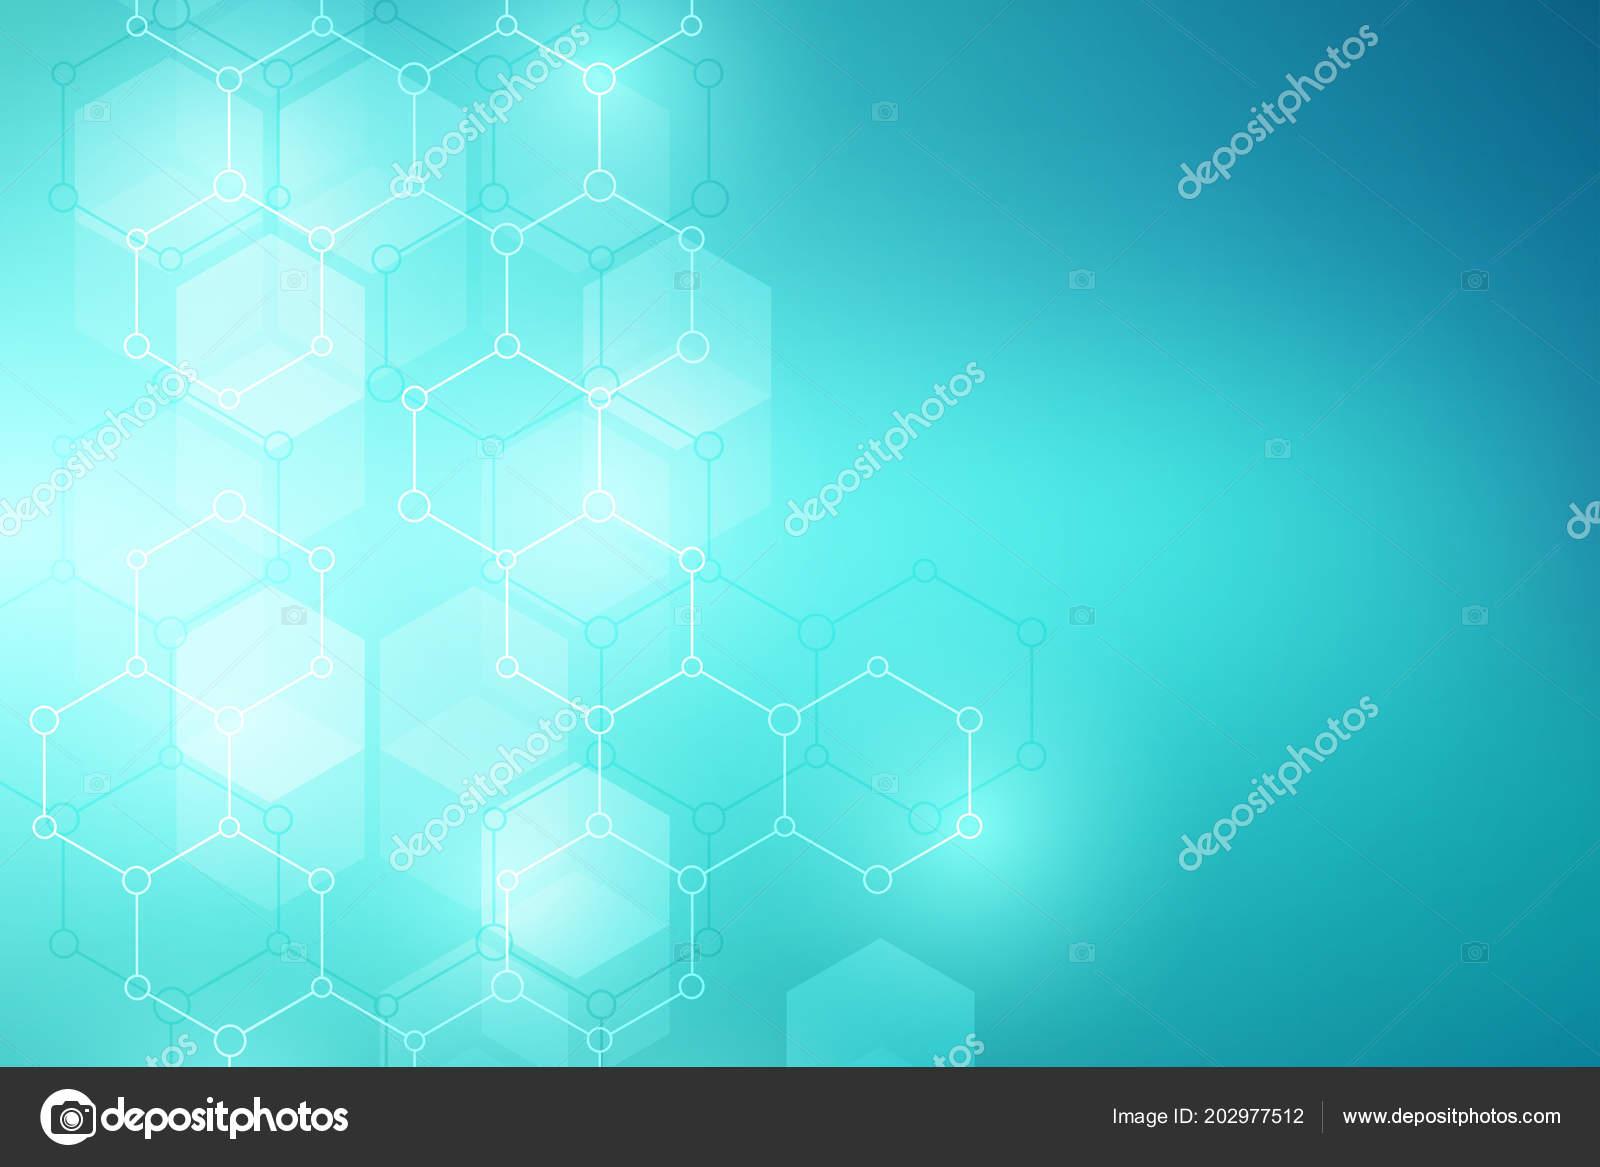 Fondo Estructura Molecular Resumen Antecedentes Con Molécula